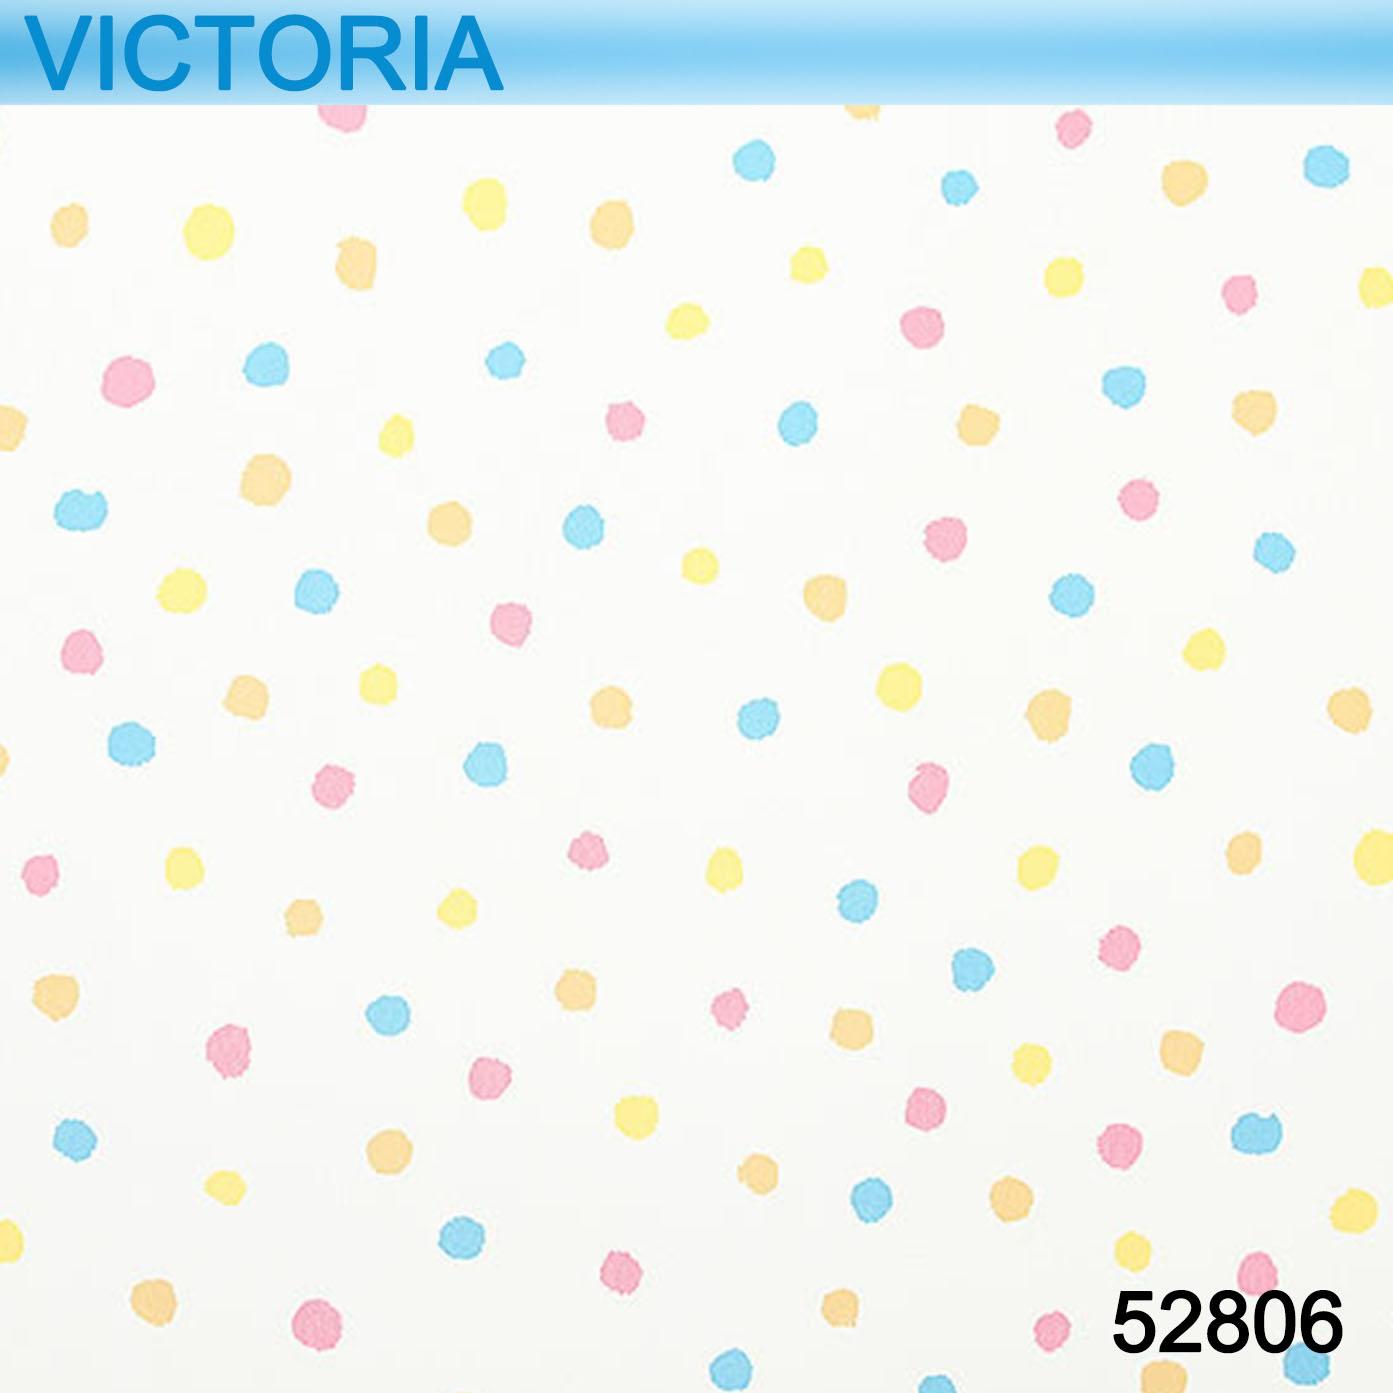 SAMPLE waterproof wallpaper sample Cartoon dot pattern photo wallpaper 1393x1393